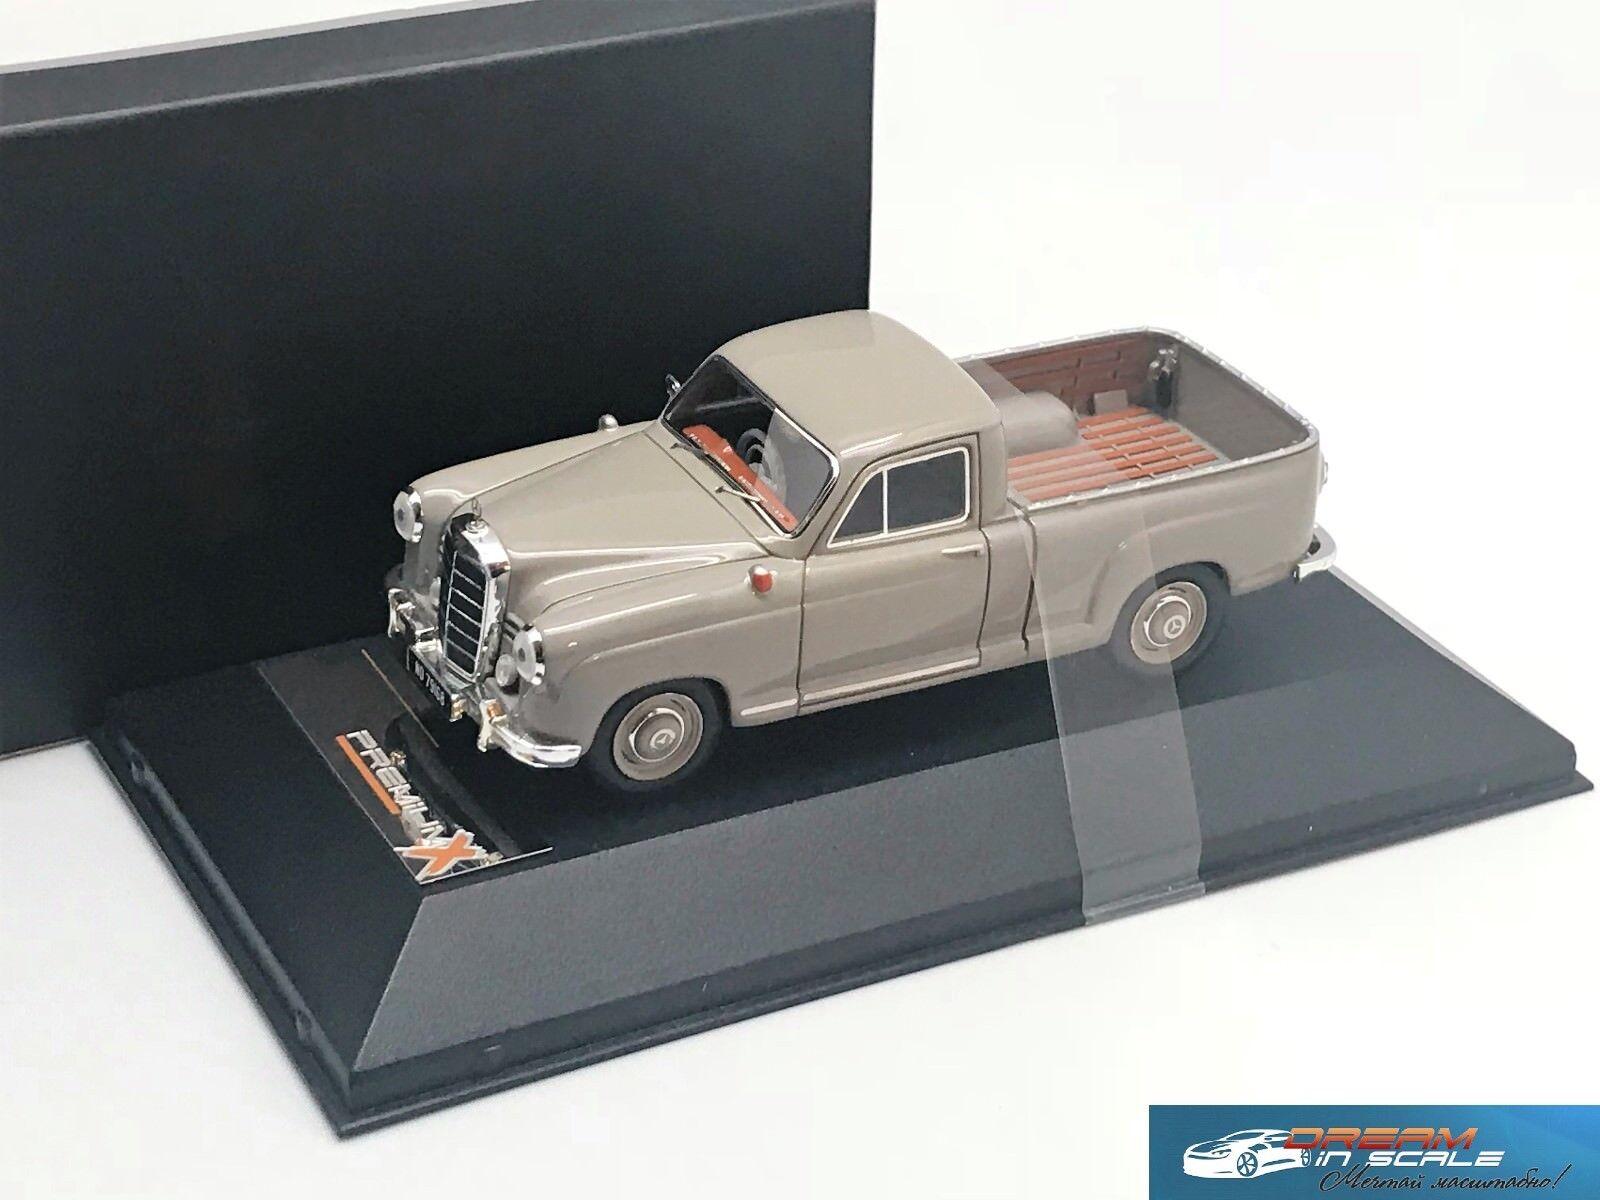 colores increíbles Mercedes Benz 180 D BAKKIE gris 1956 1956 1956 Premium X PR0209 1 43  nuevo estilo